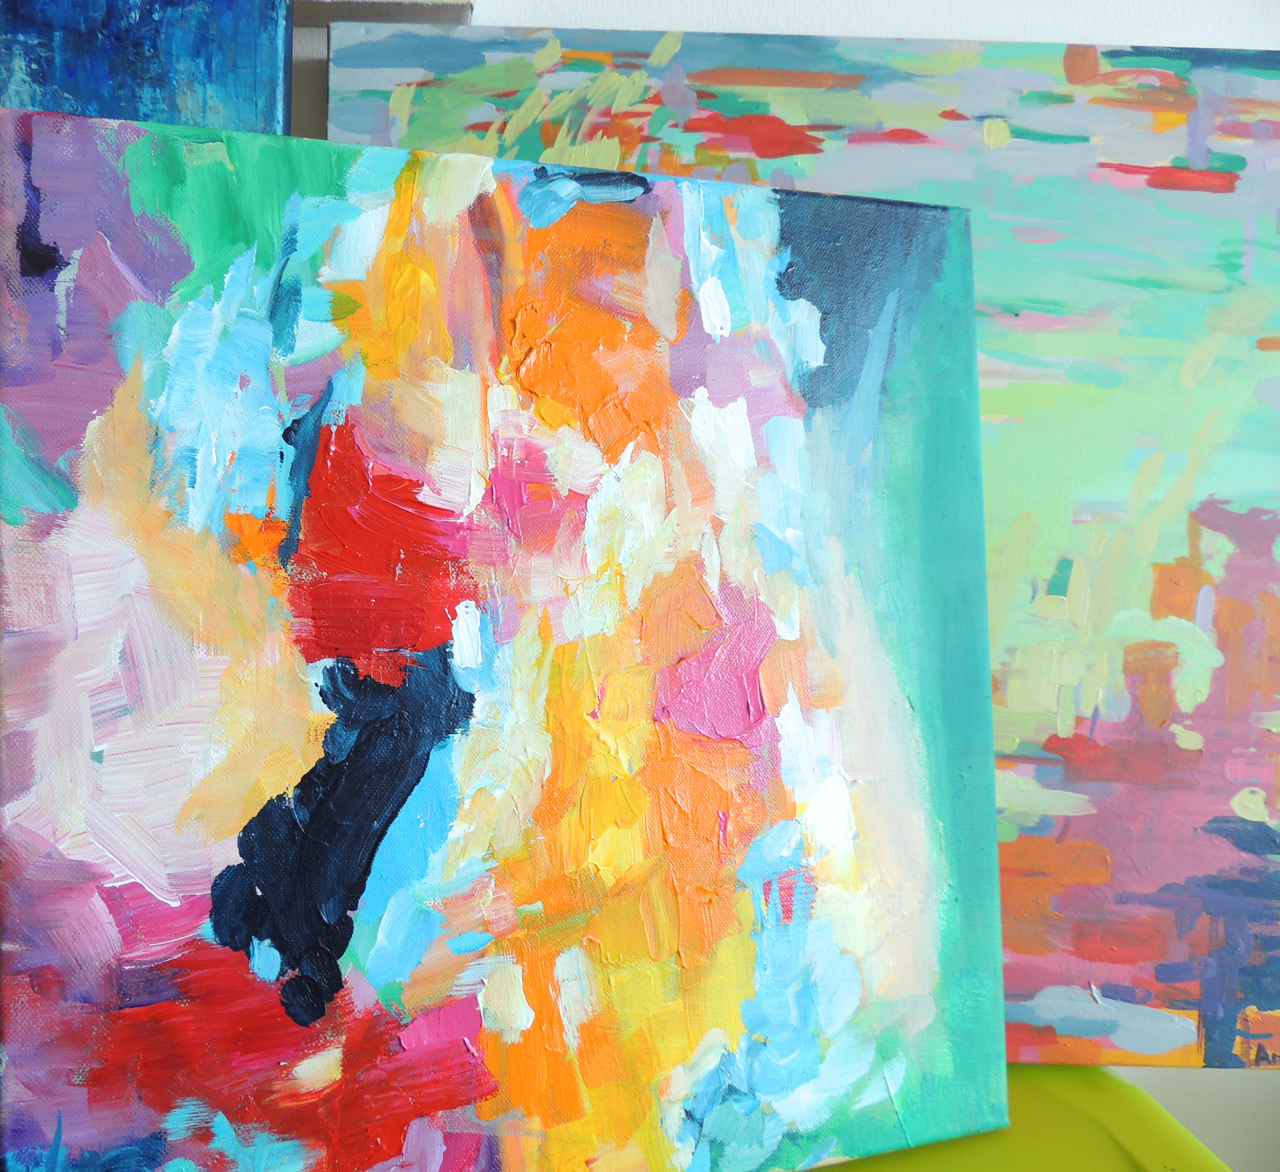 I love color. Stepping into my studio feels like I'm receiving a big color hug!